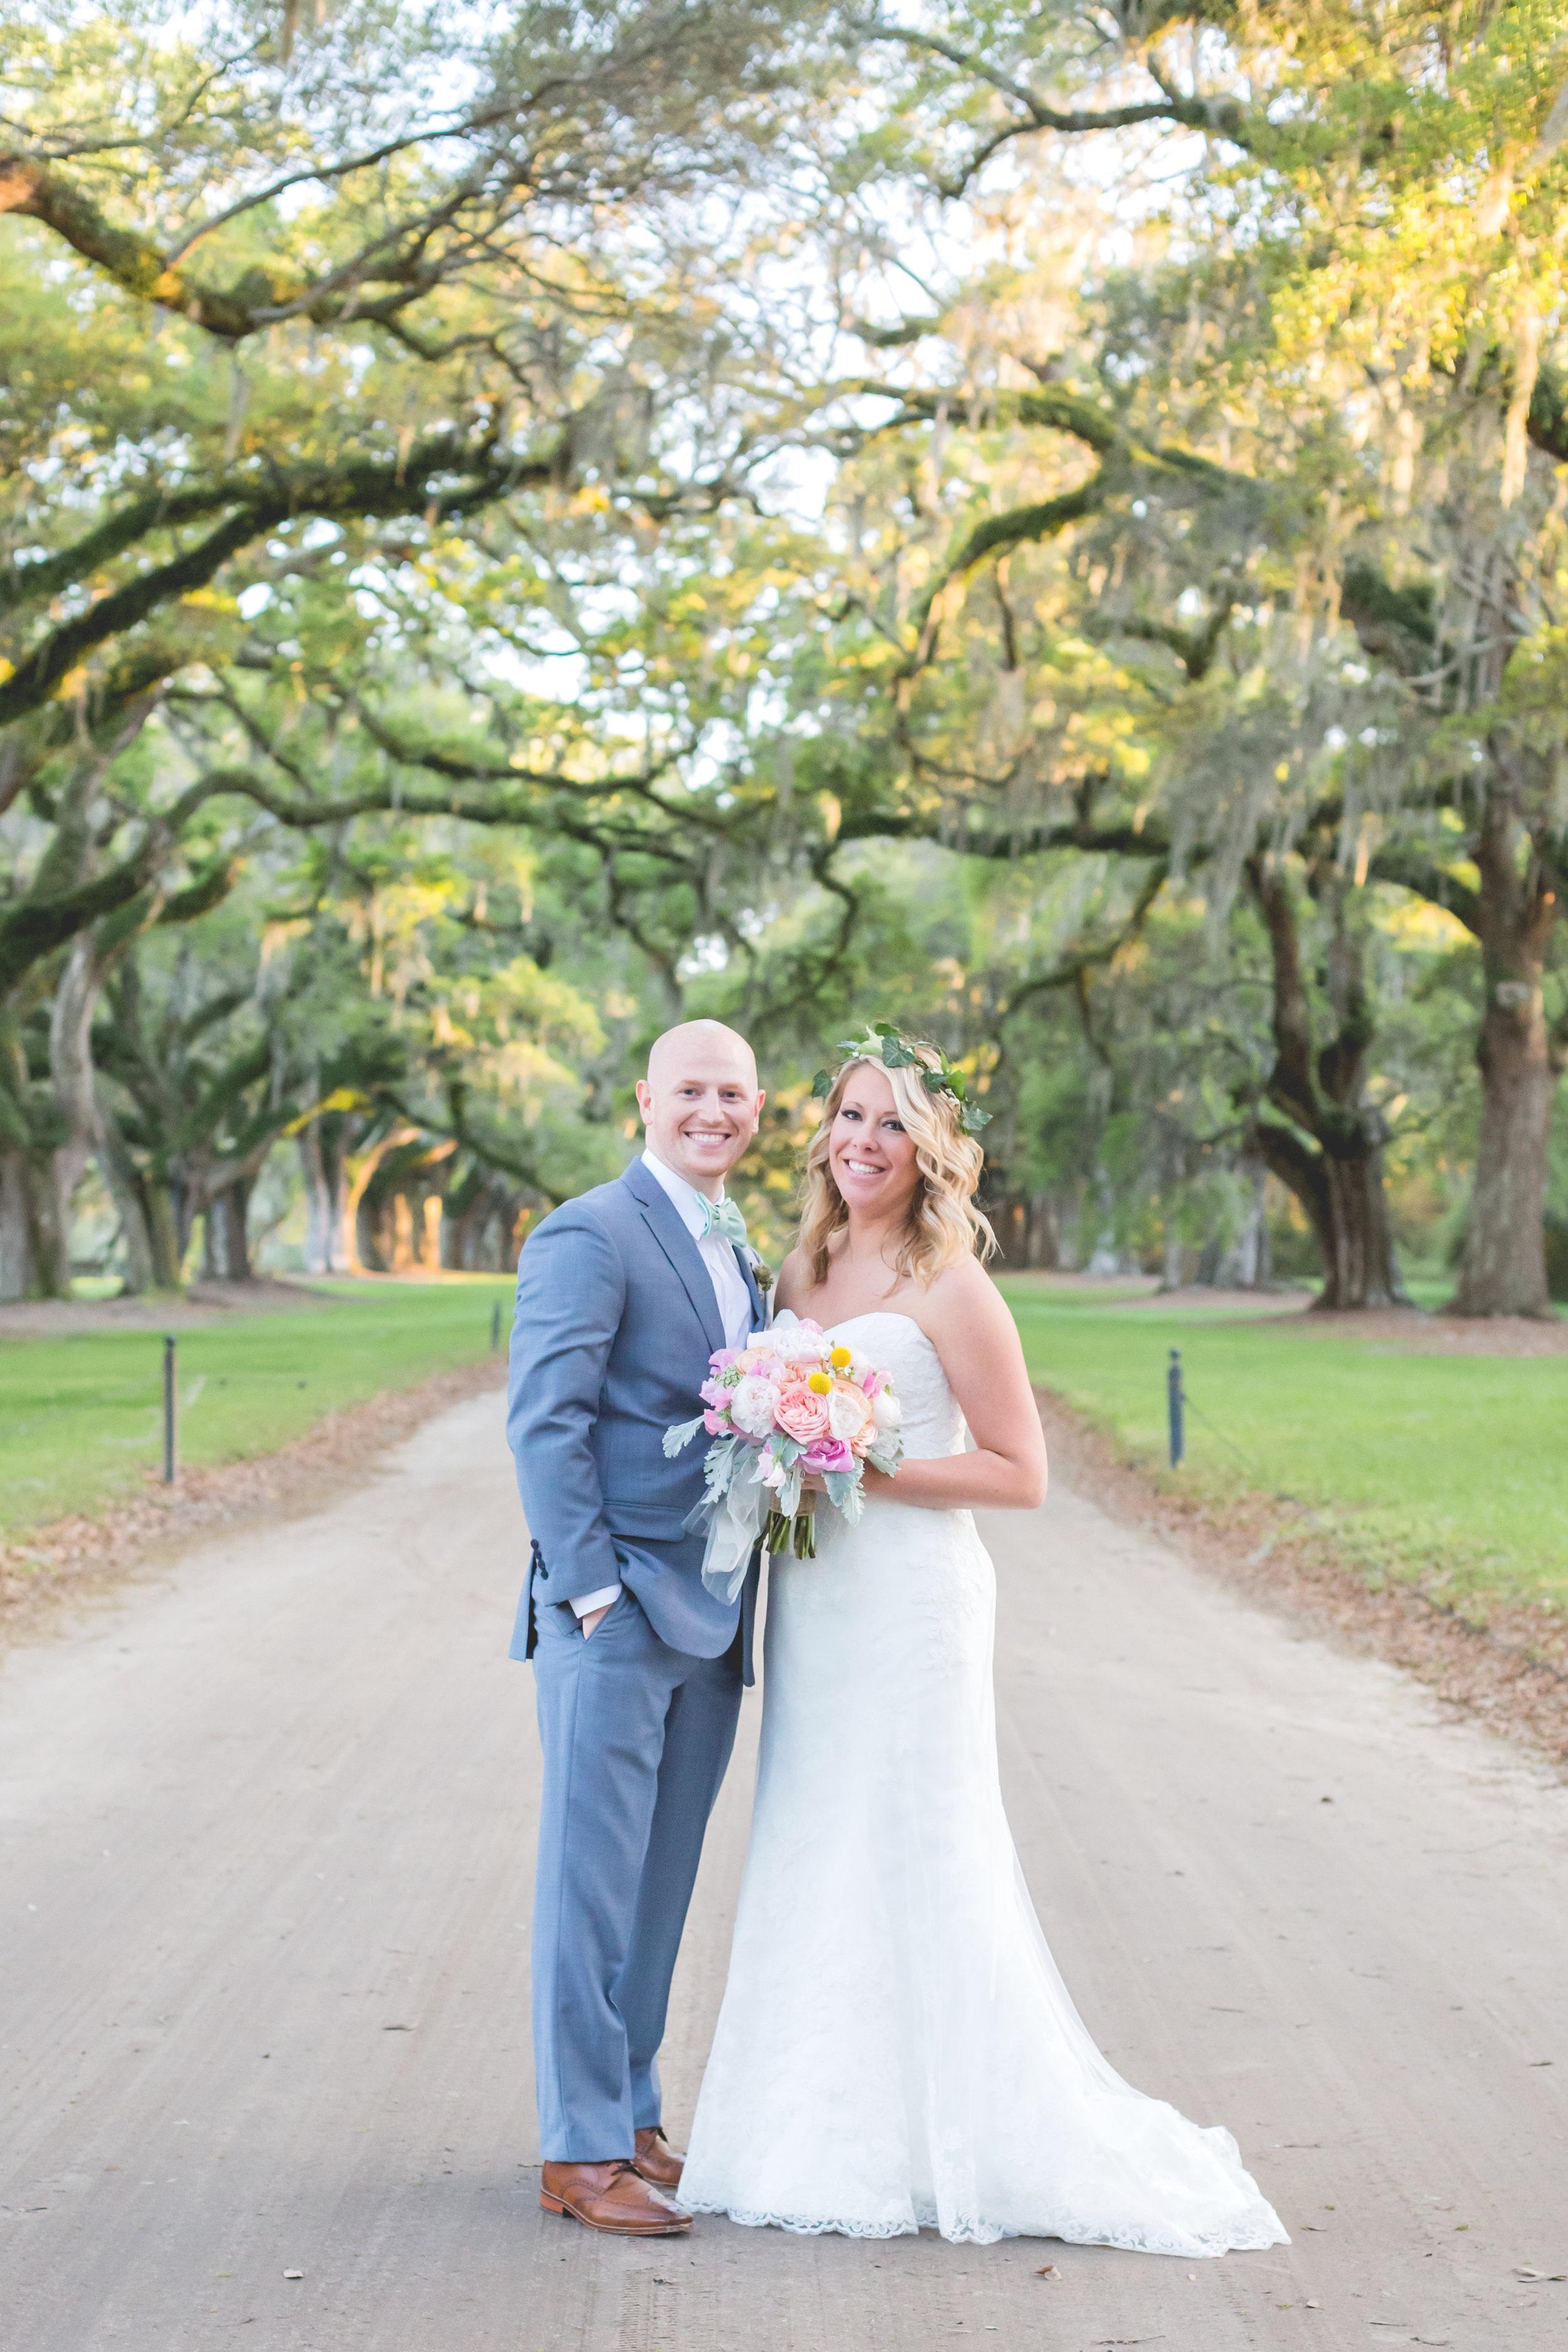 newlyweds-live-oaks-boone-hall-plantation-charleston-wedding-kailee-dimeglio-photography.jpg